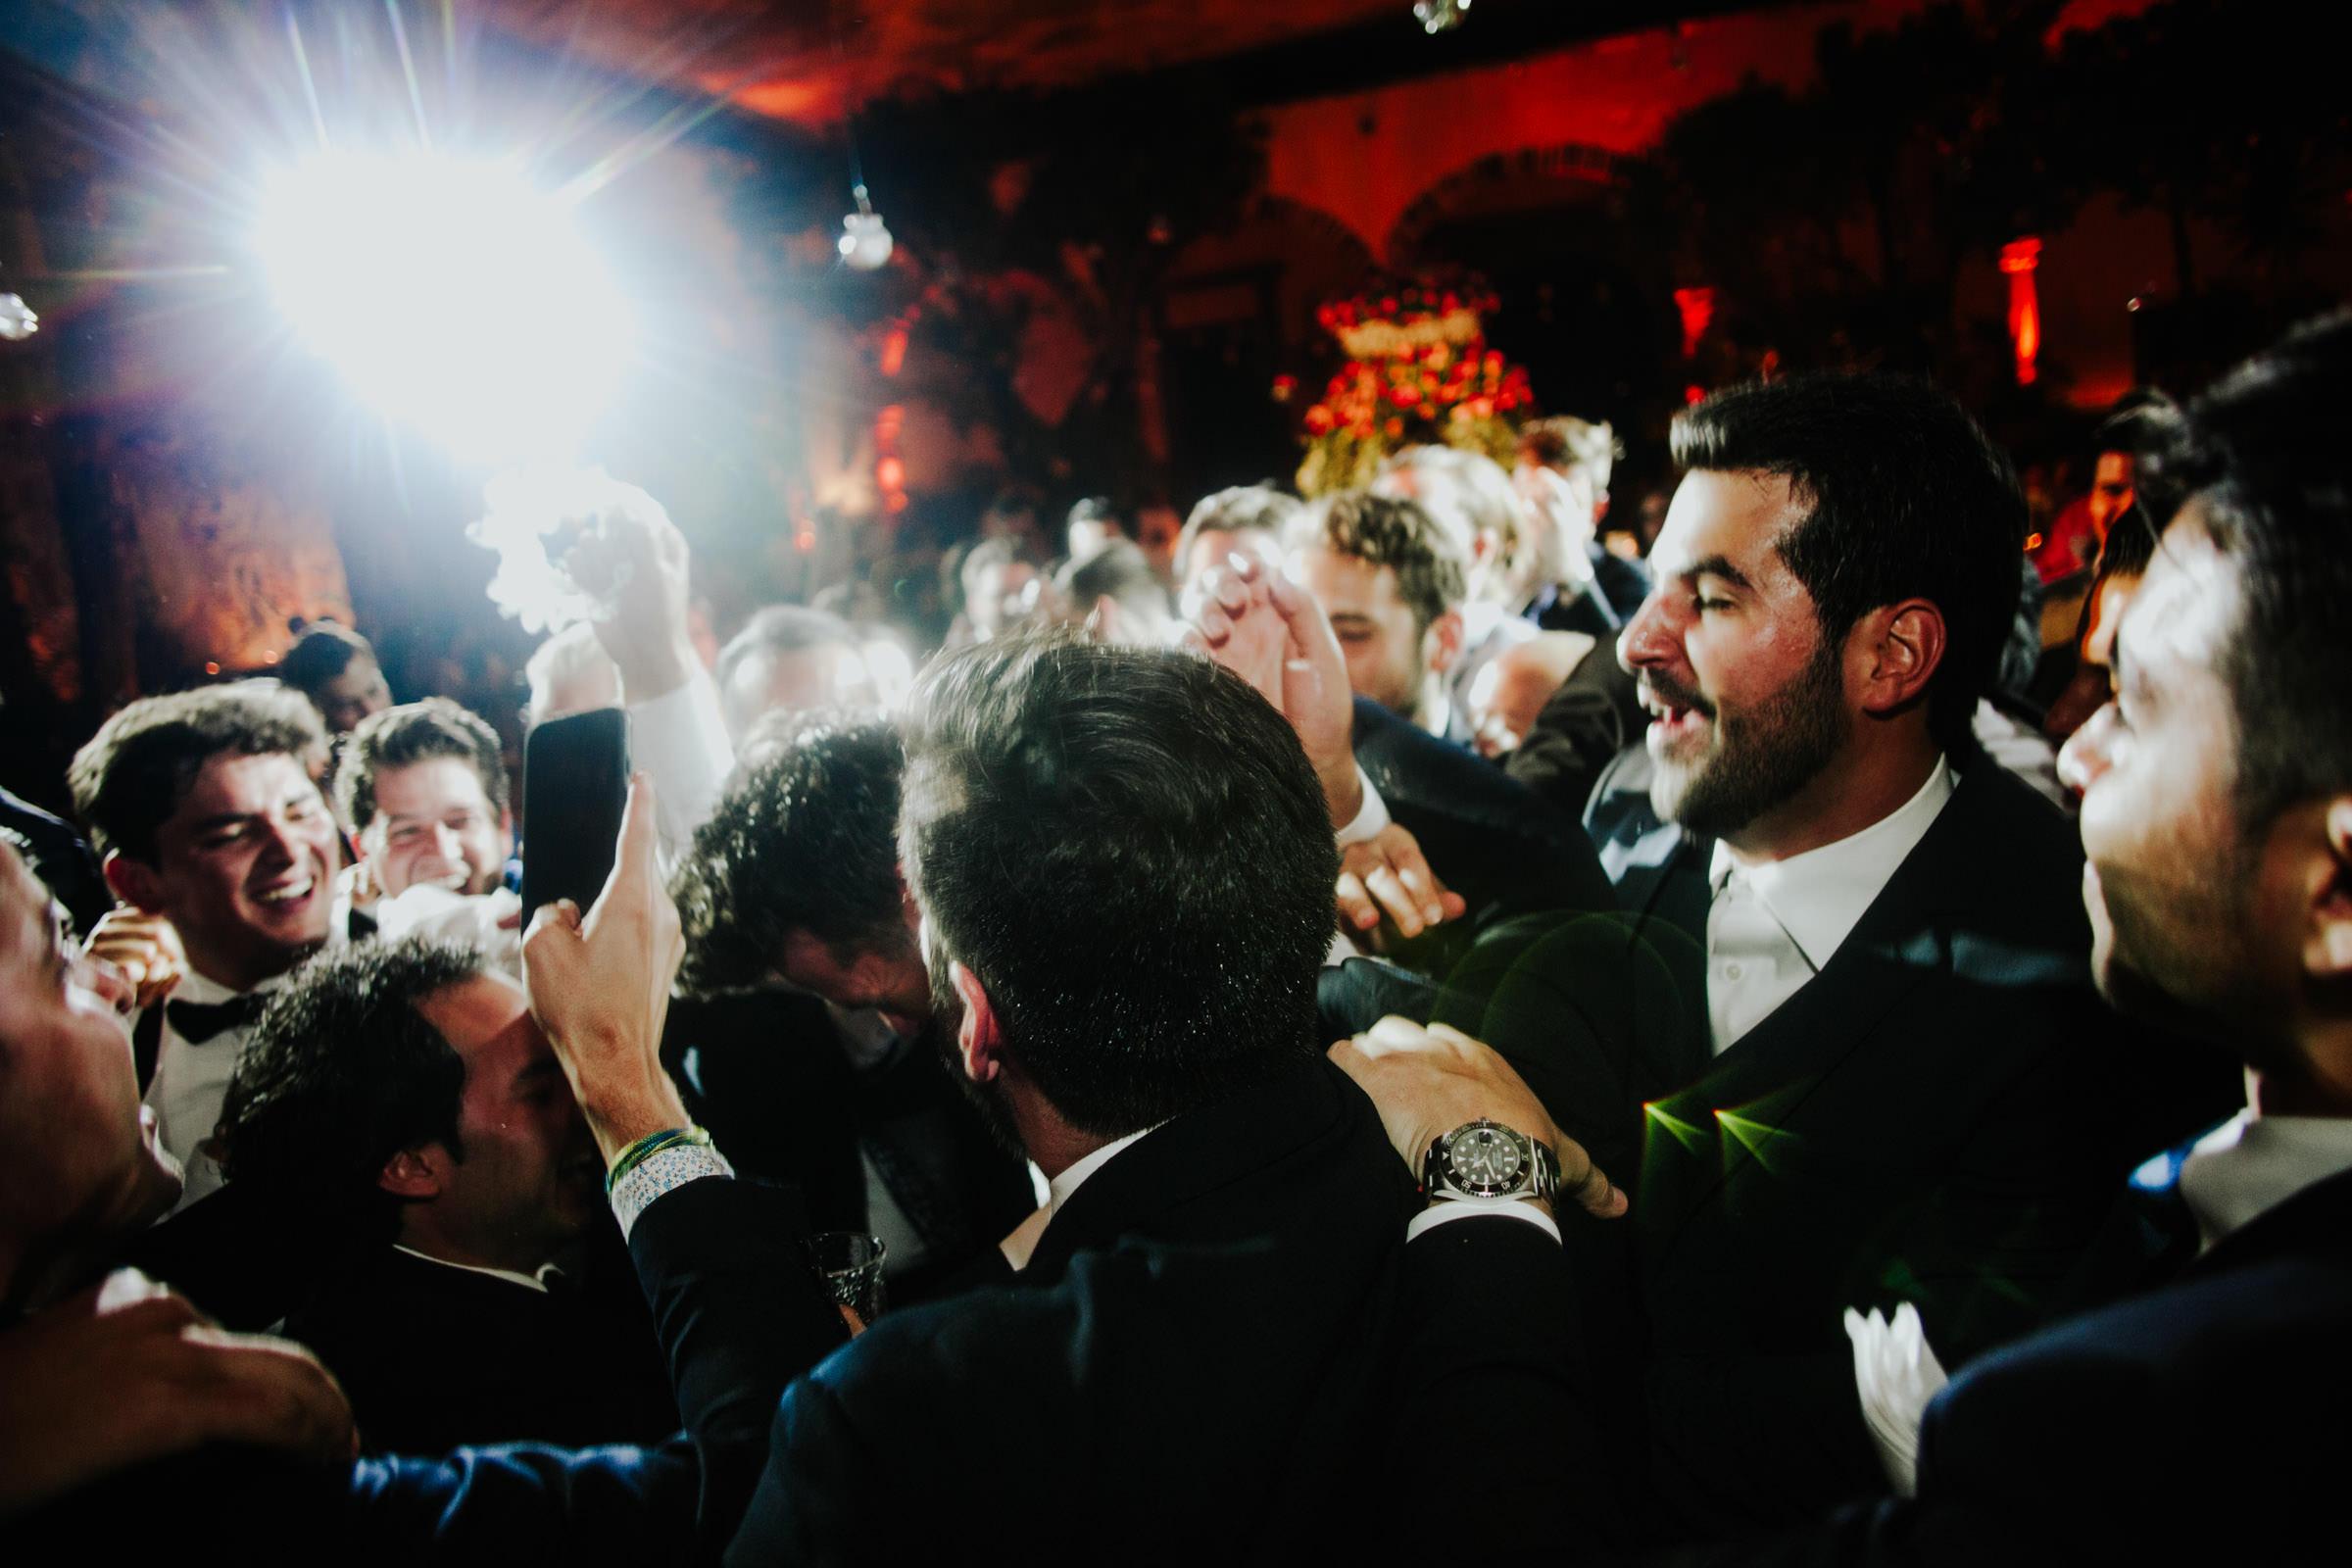 San-Miguel-de-Allende-Wedding-Photography-Parroquia-Instituto-Boda-Fotografia-Fer-Sergio-Pierce-Lifestyle-Photography0090.JPG